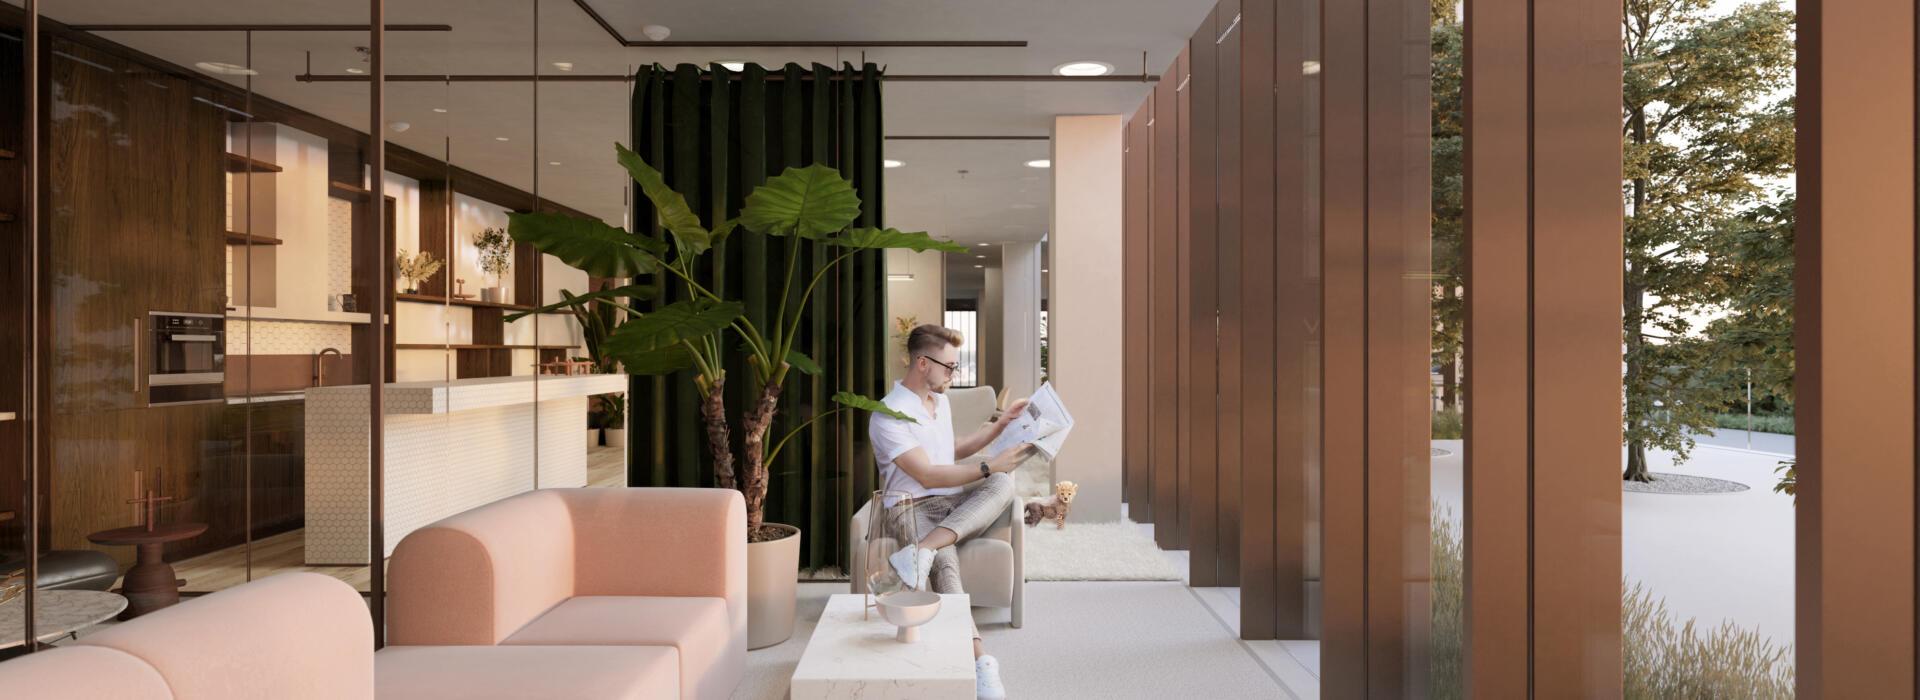 kitchenette lounge 7